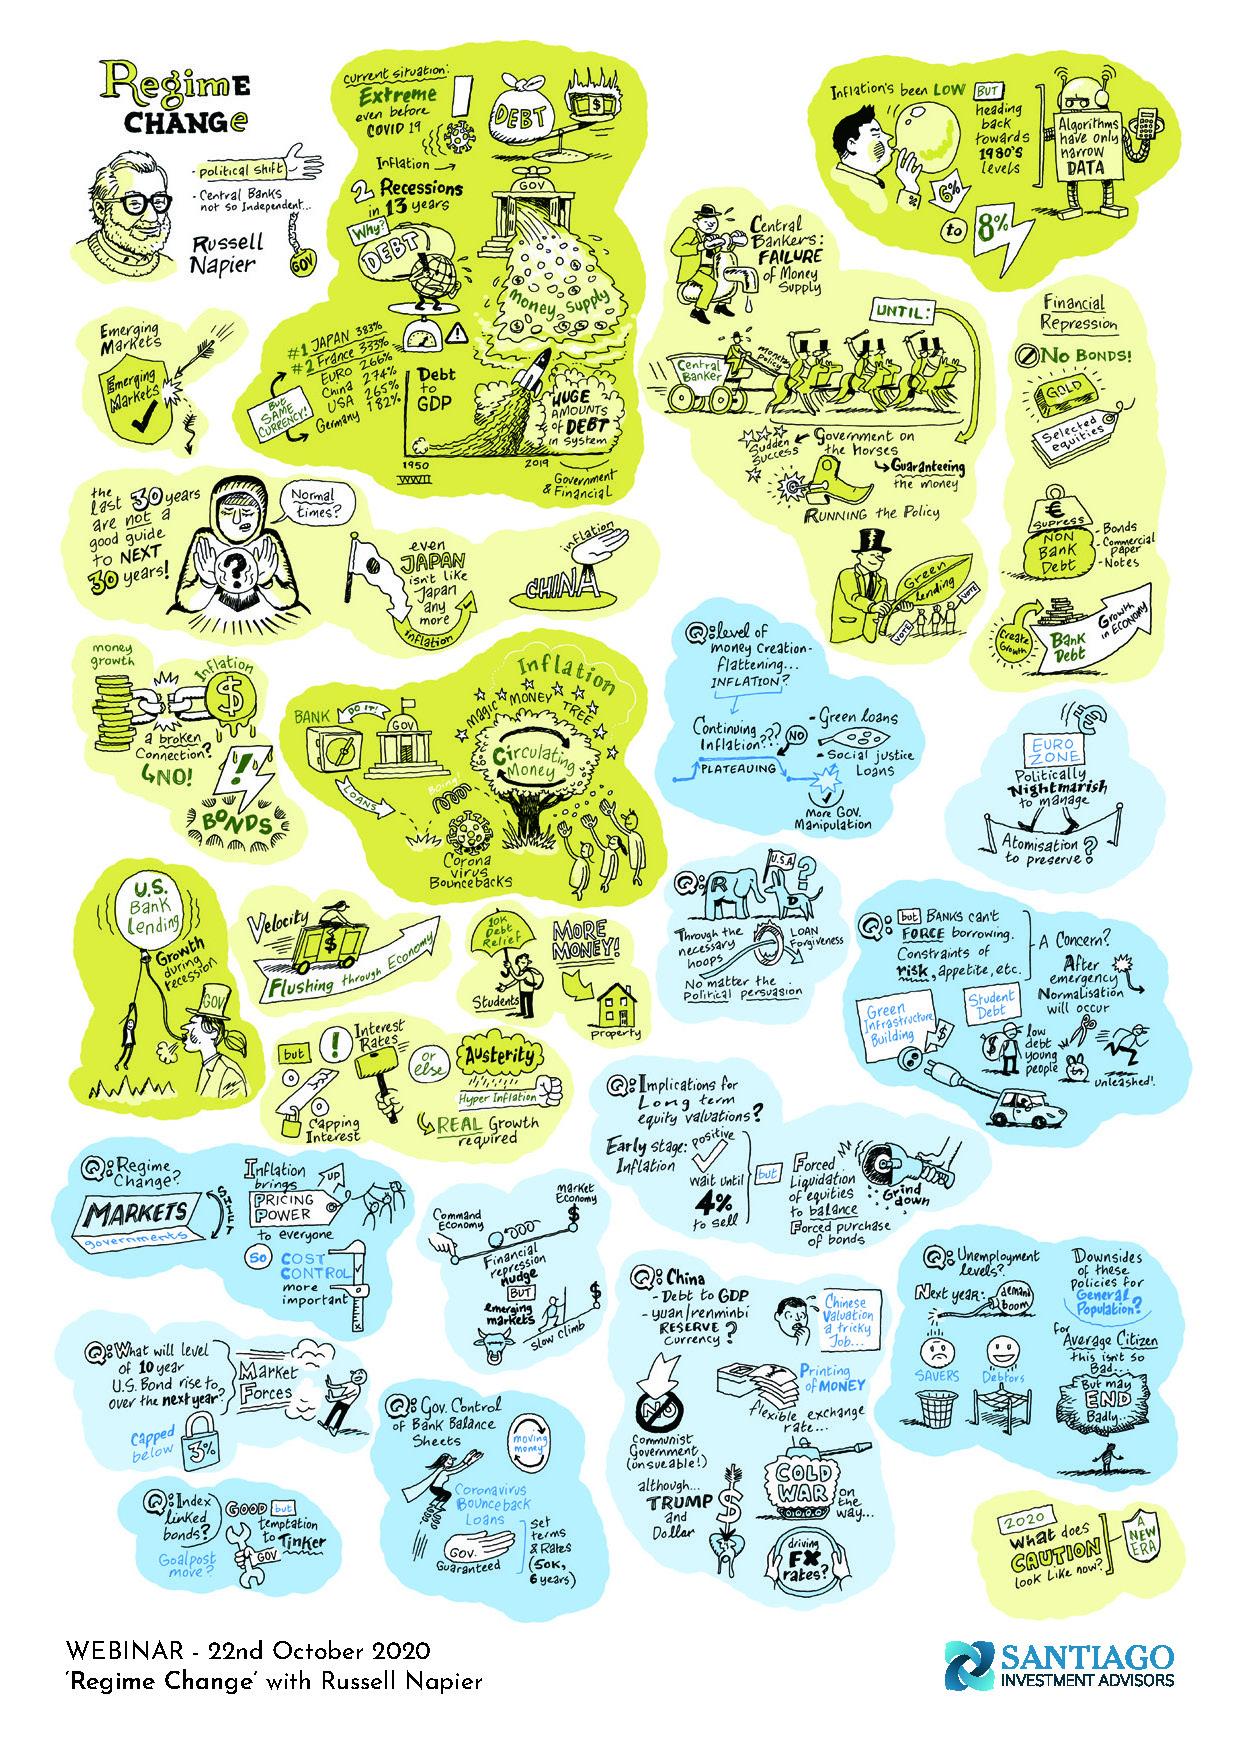 Santiago Russell Napier Regime Change illustration